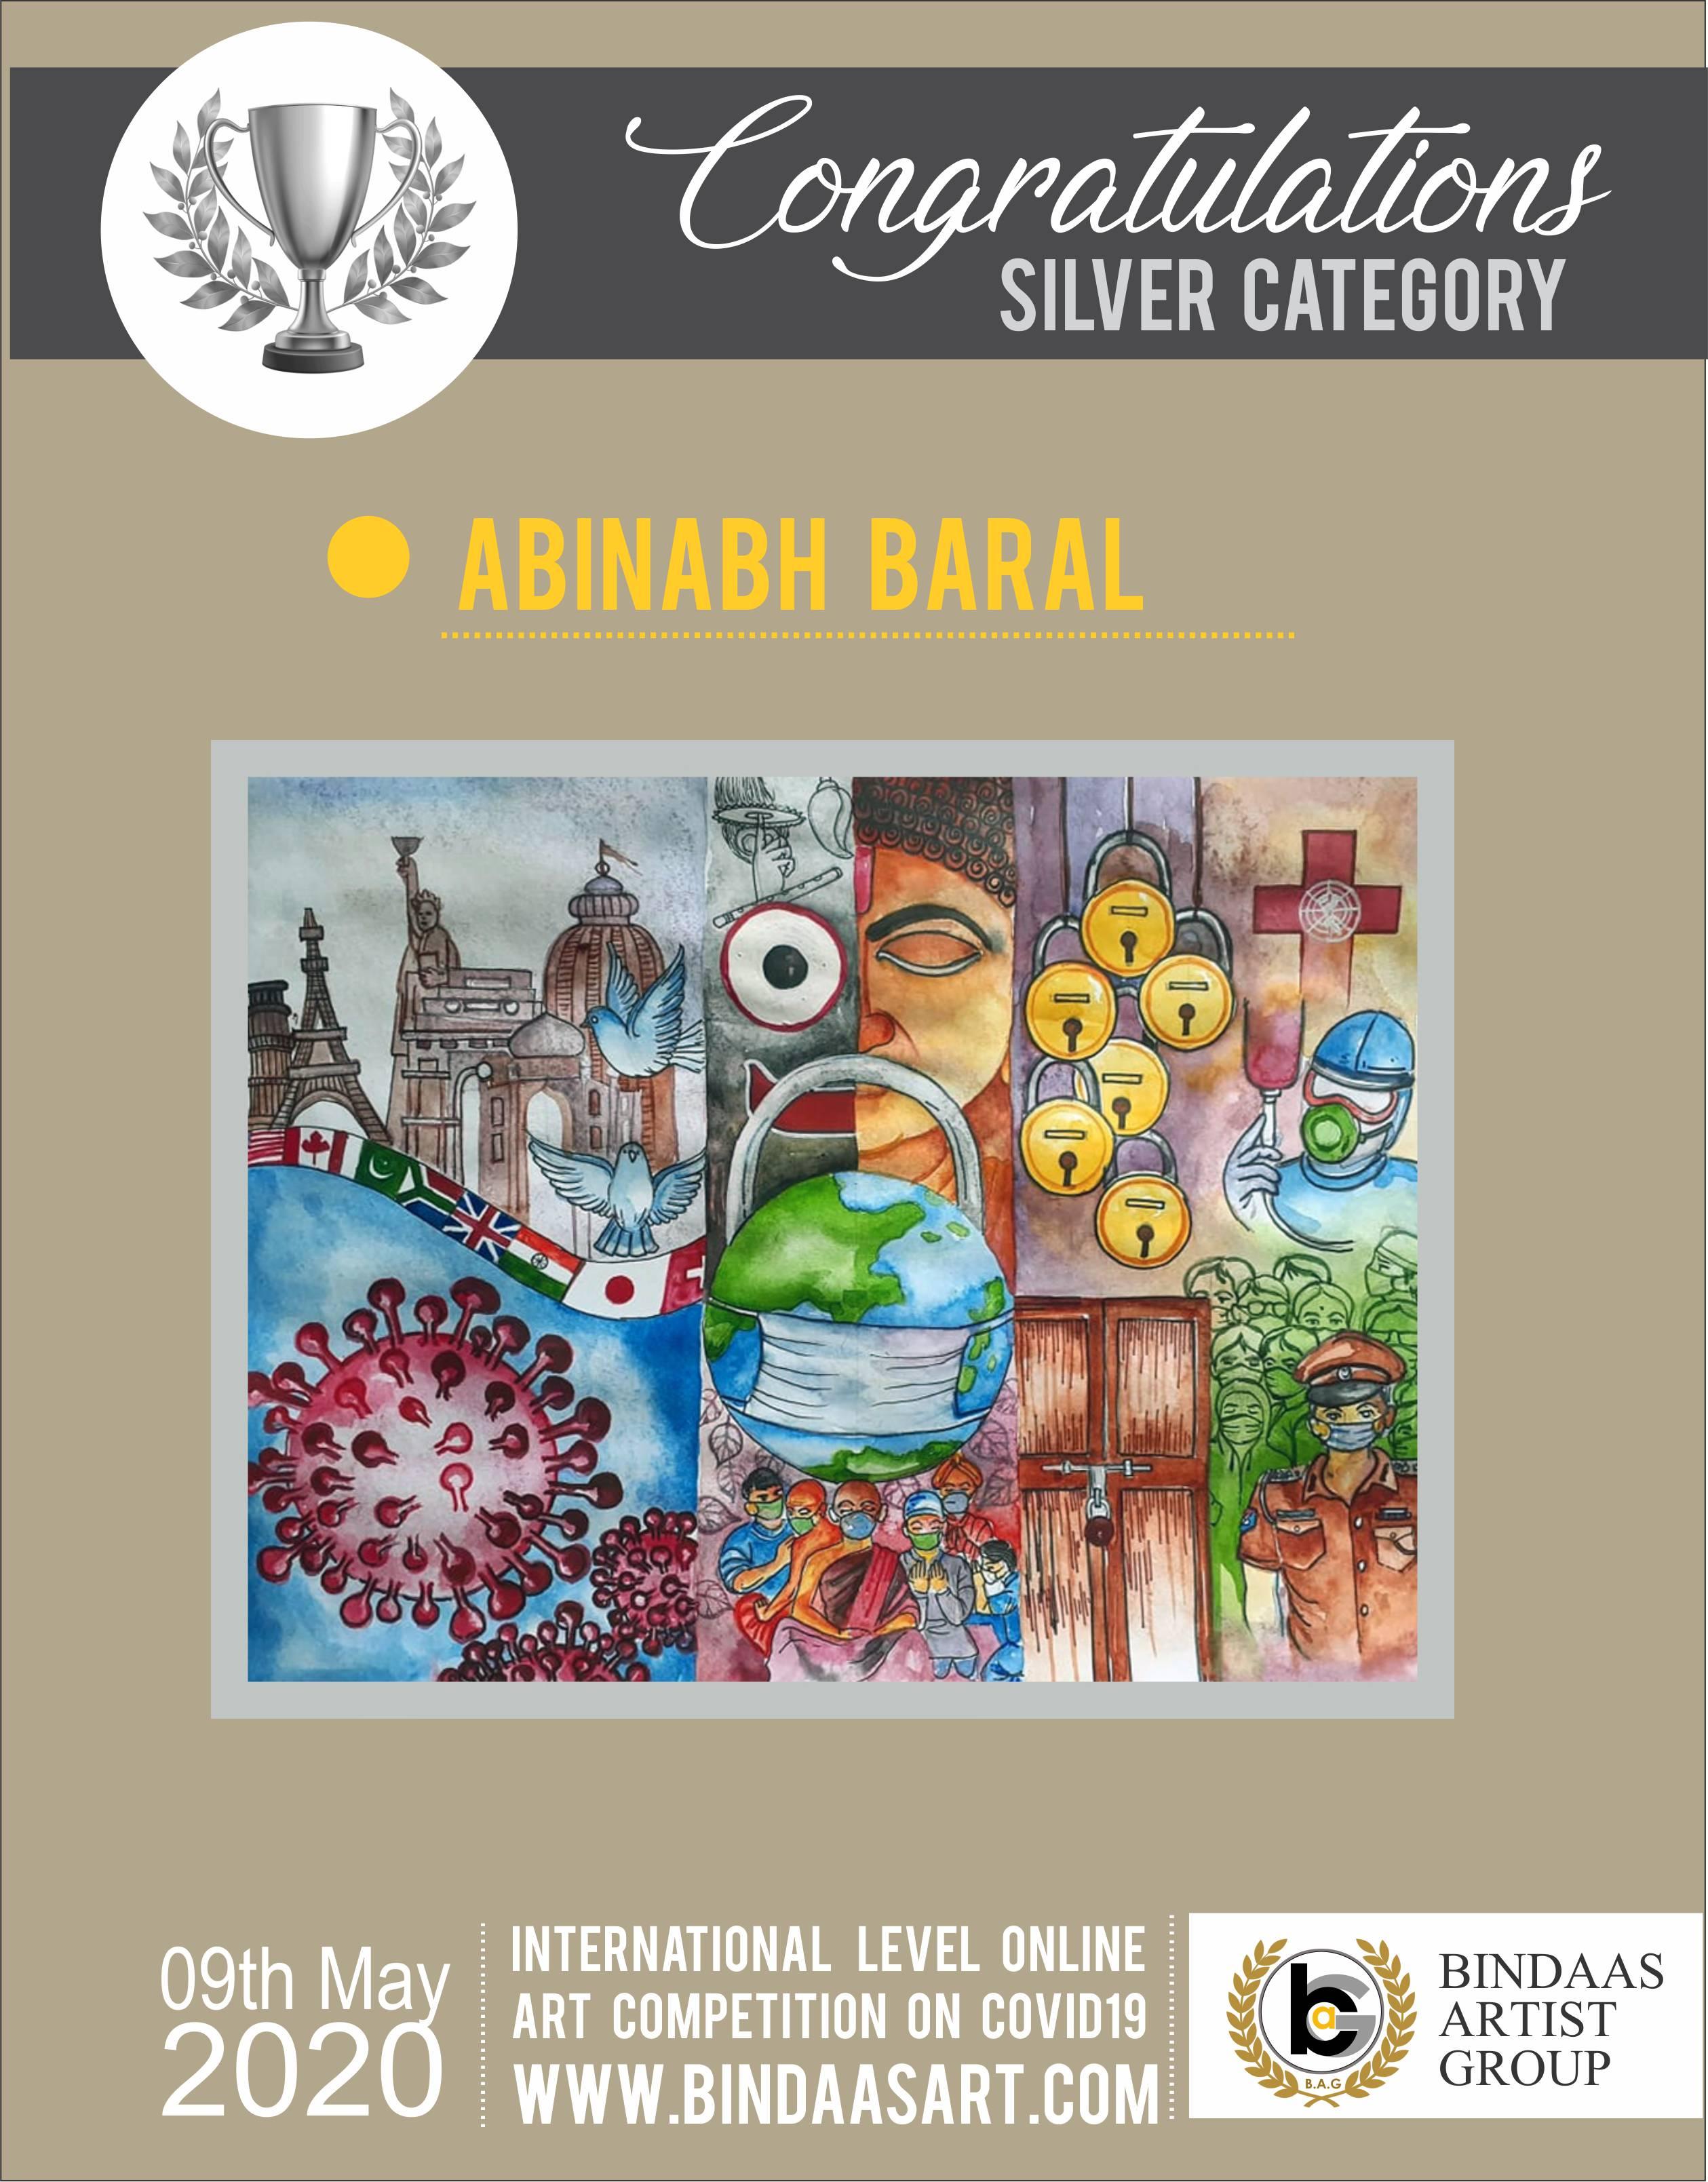 Abinabh Baral